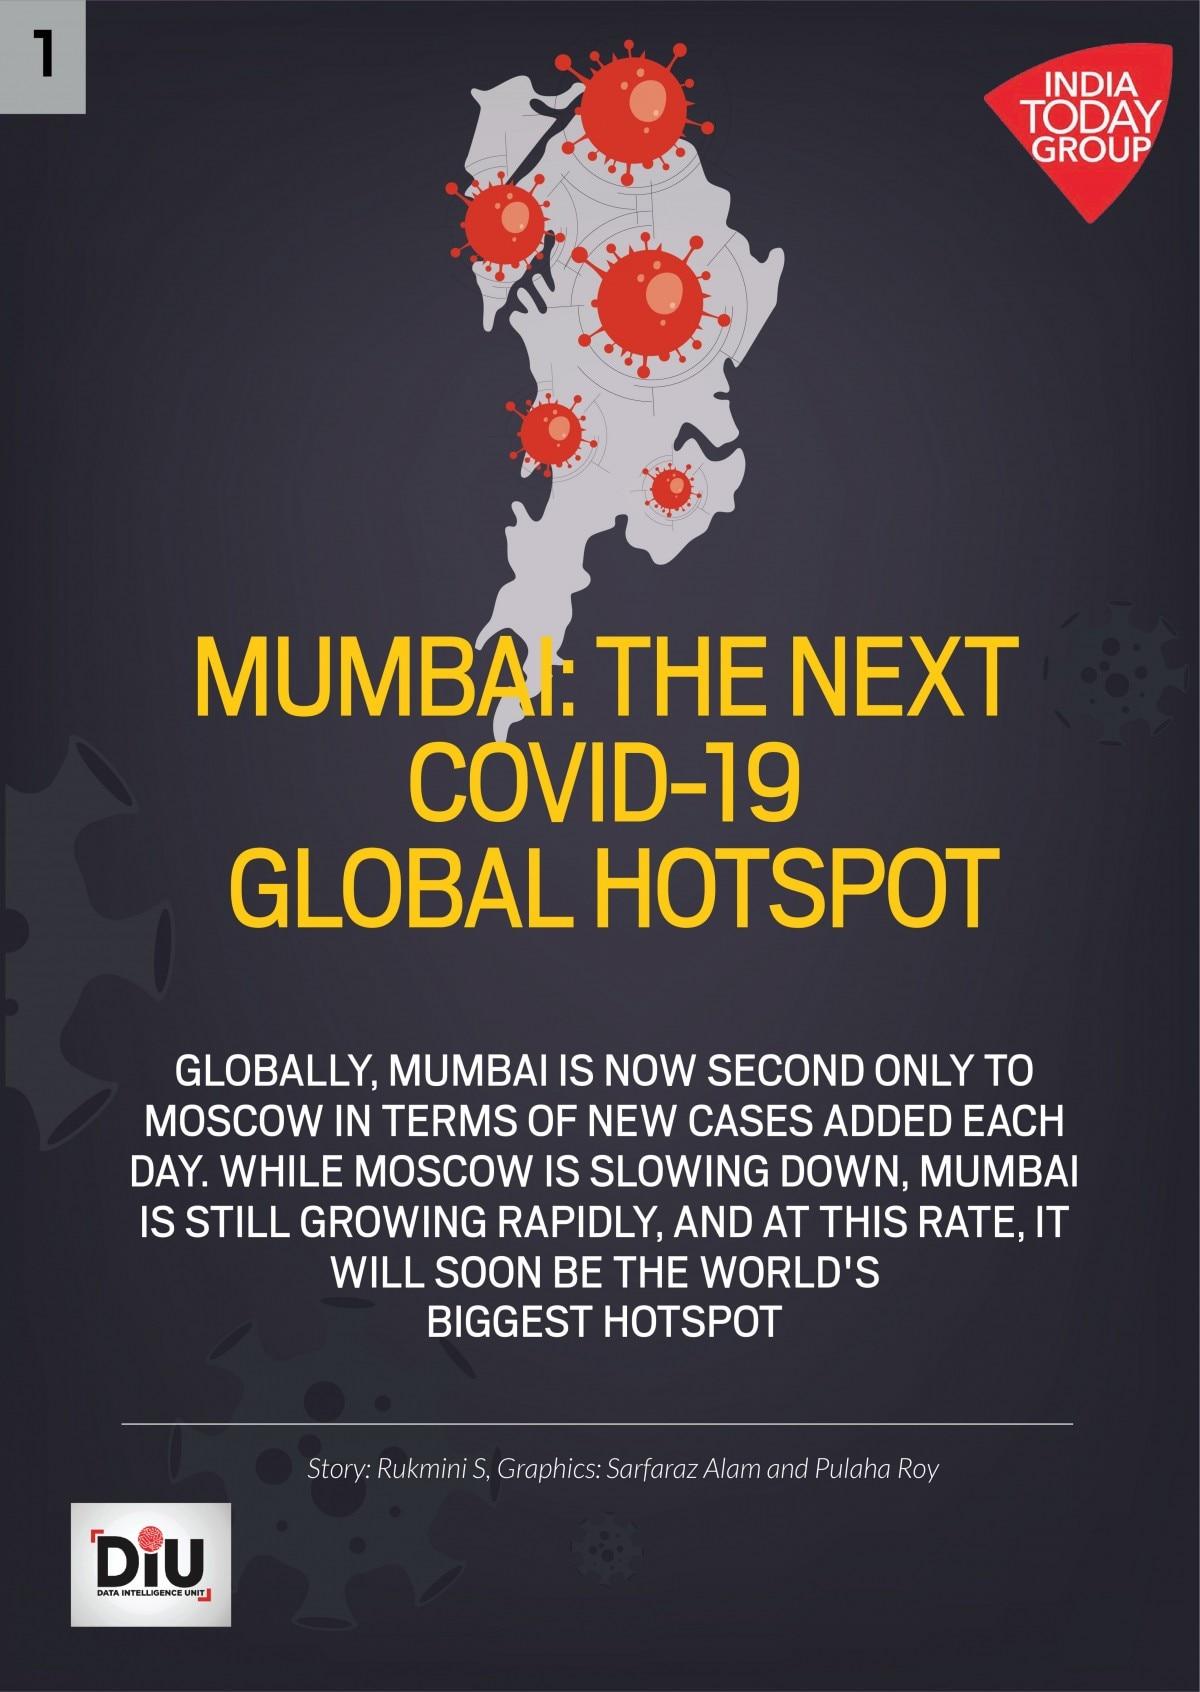 https://akm-img-a-in.tosshub.com/indiatoday/images/bodyeditor/202005/Mumbai_May24_Intro-1-1200x6000.jpg?TuOqUsQGZqmv1V2ZGtobeBwymmNFv_sC